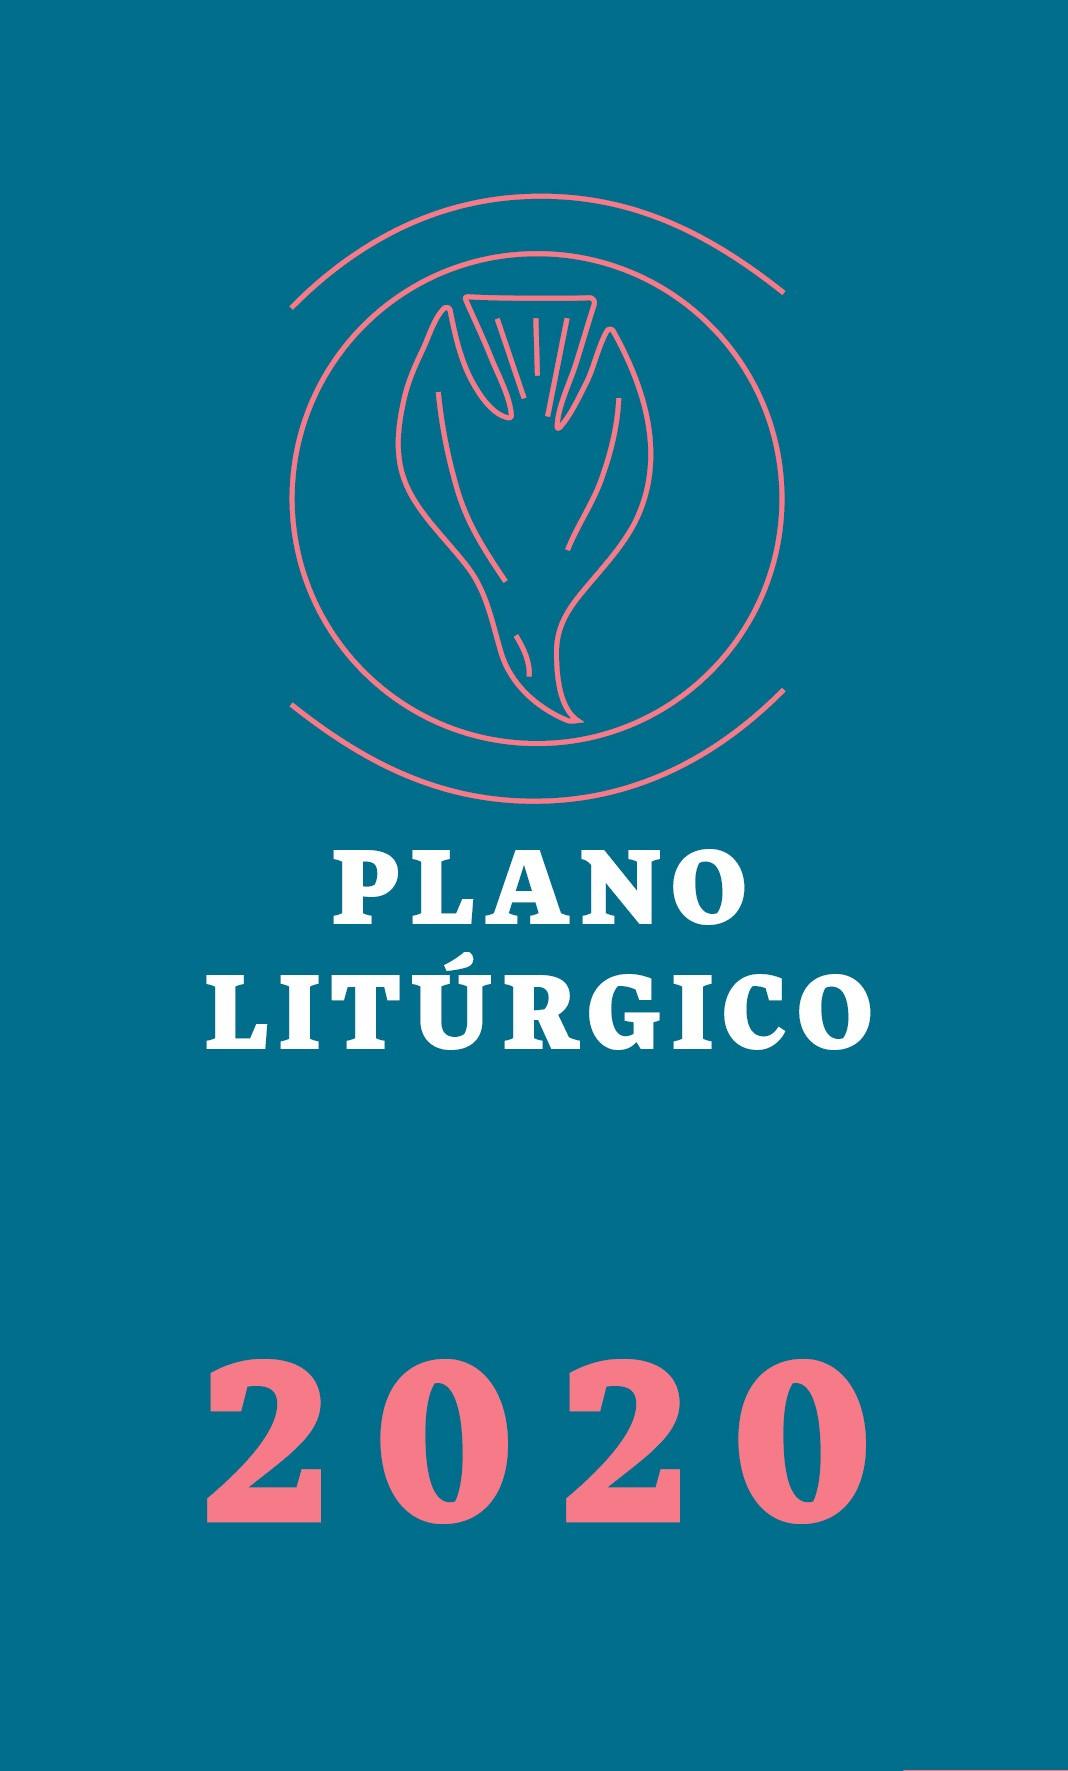 Planos unick forex 2020